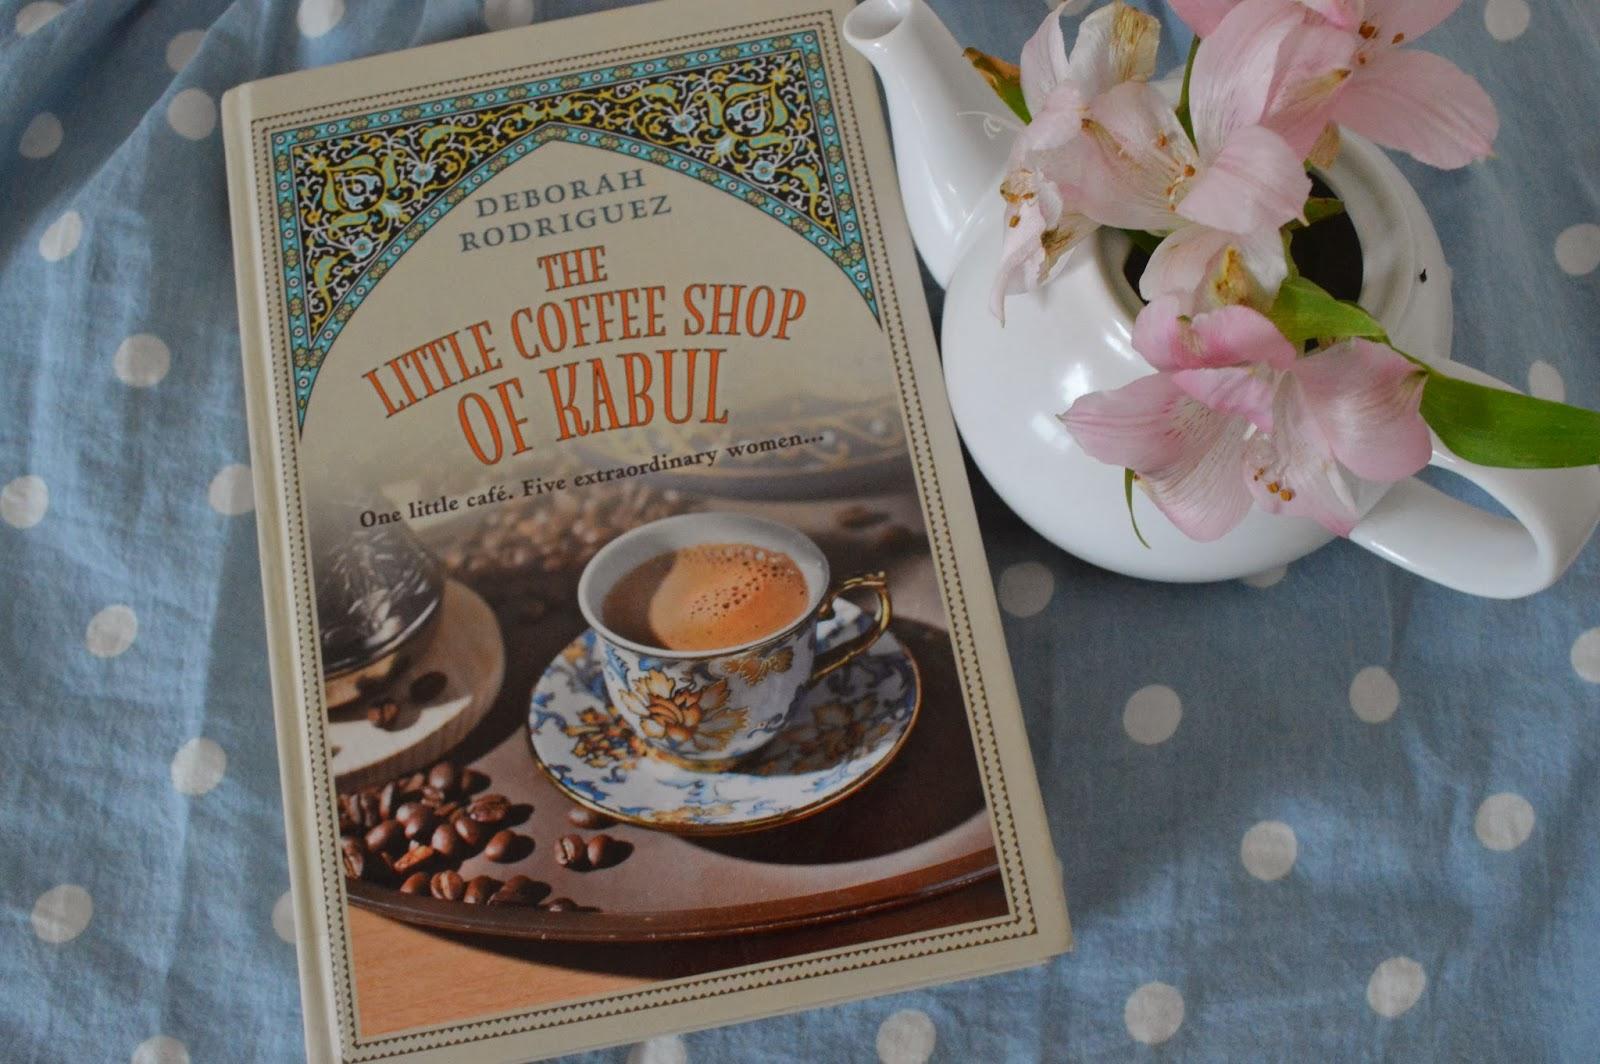 The Little Coffee Shop of Kabul, Deborah Rodriguez, review, book cover, hardback, teapot, flowers, Afghanistan